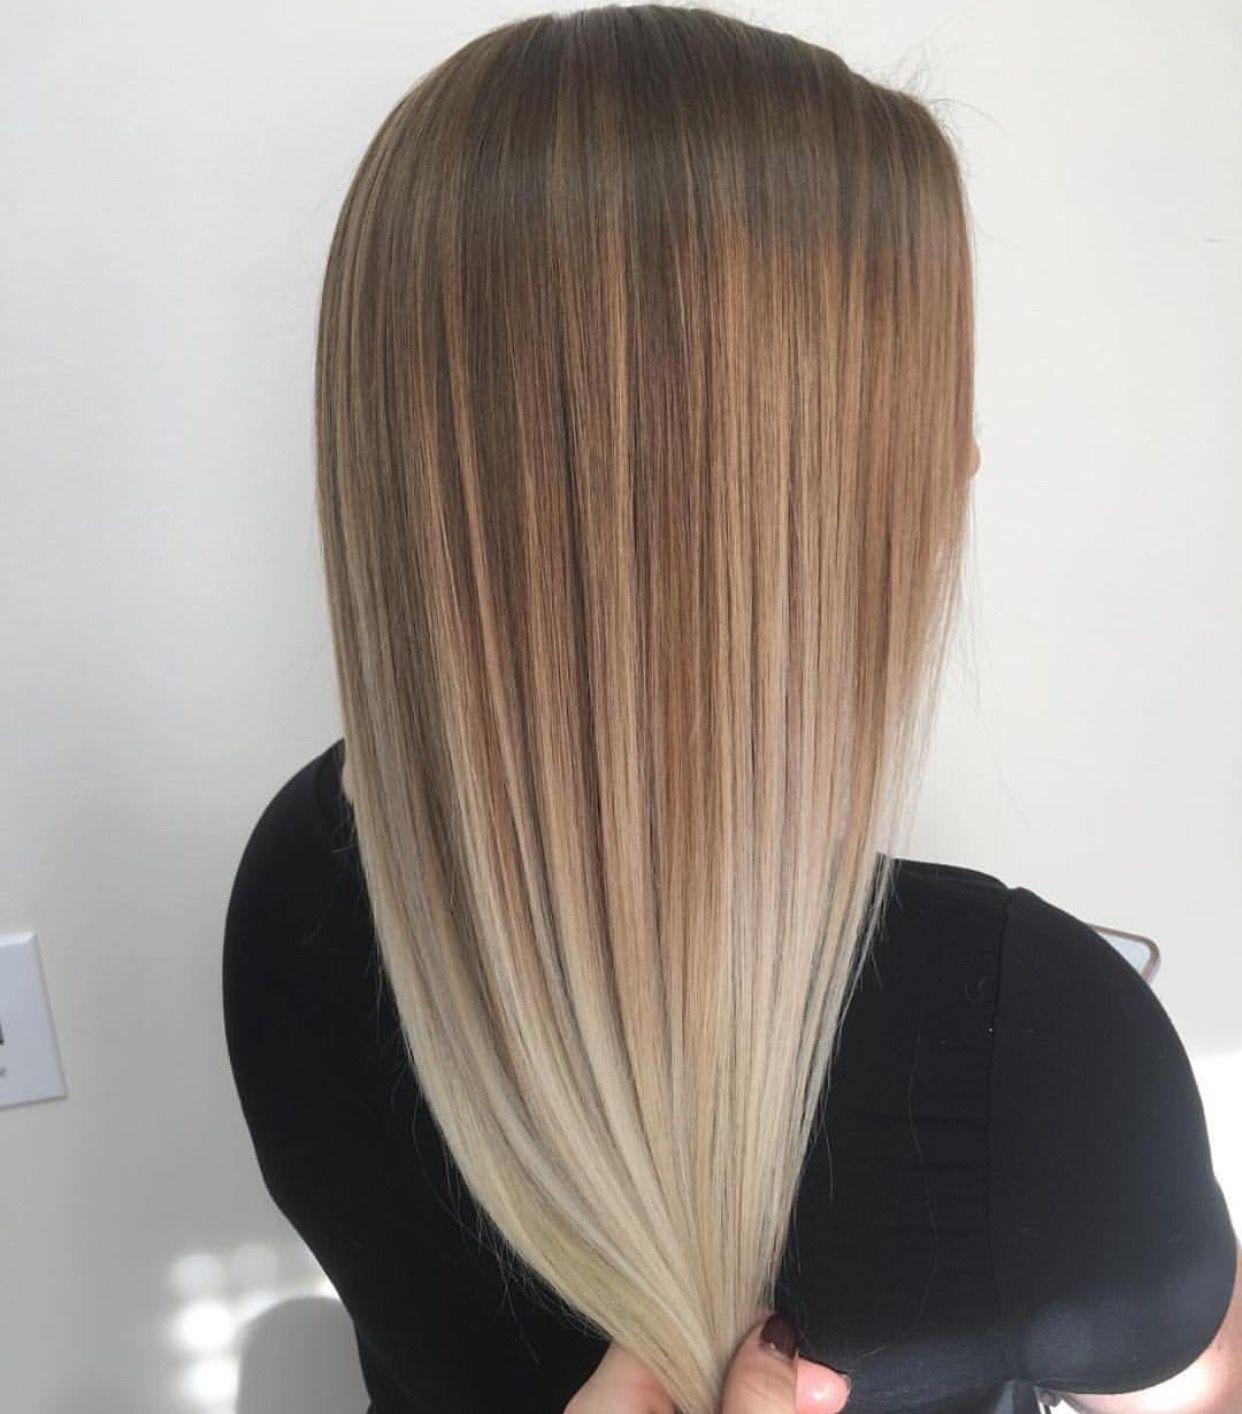 Balayage Chloedebus Balayage Hair Blonde Balayage Straight Hair Color Melting Hair